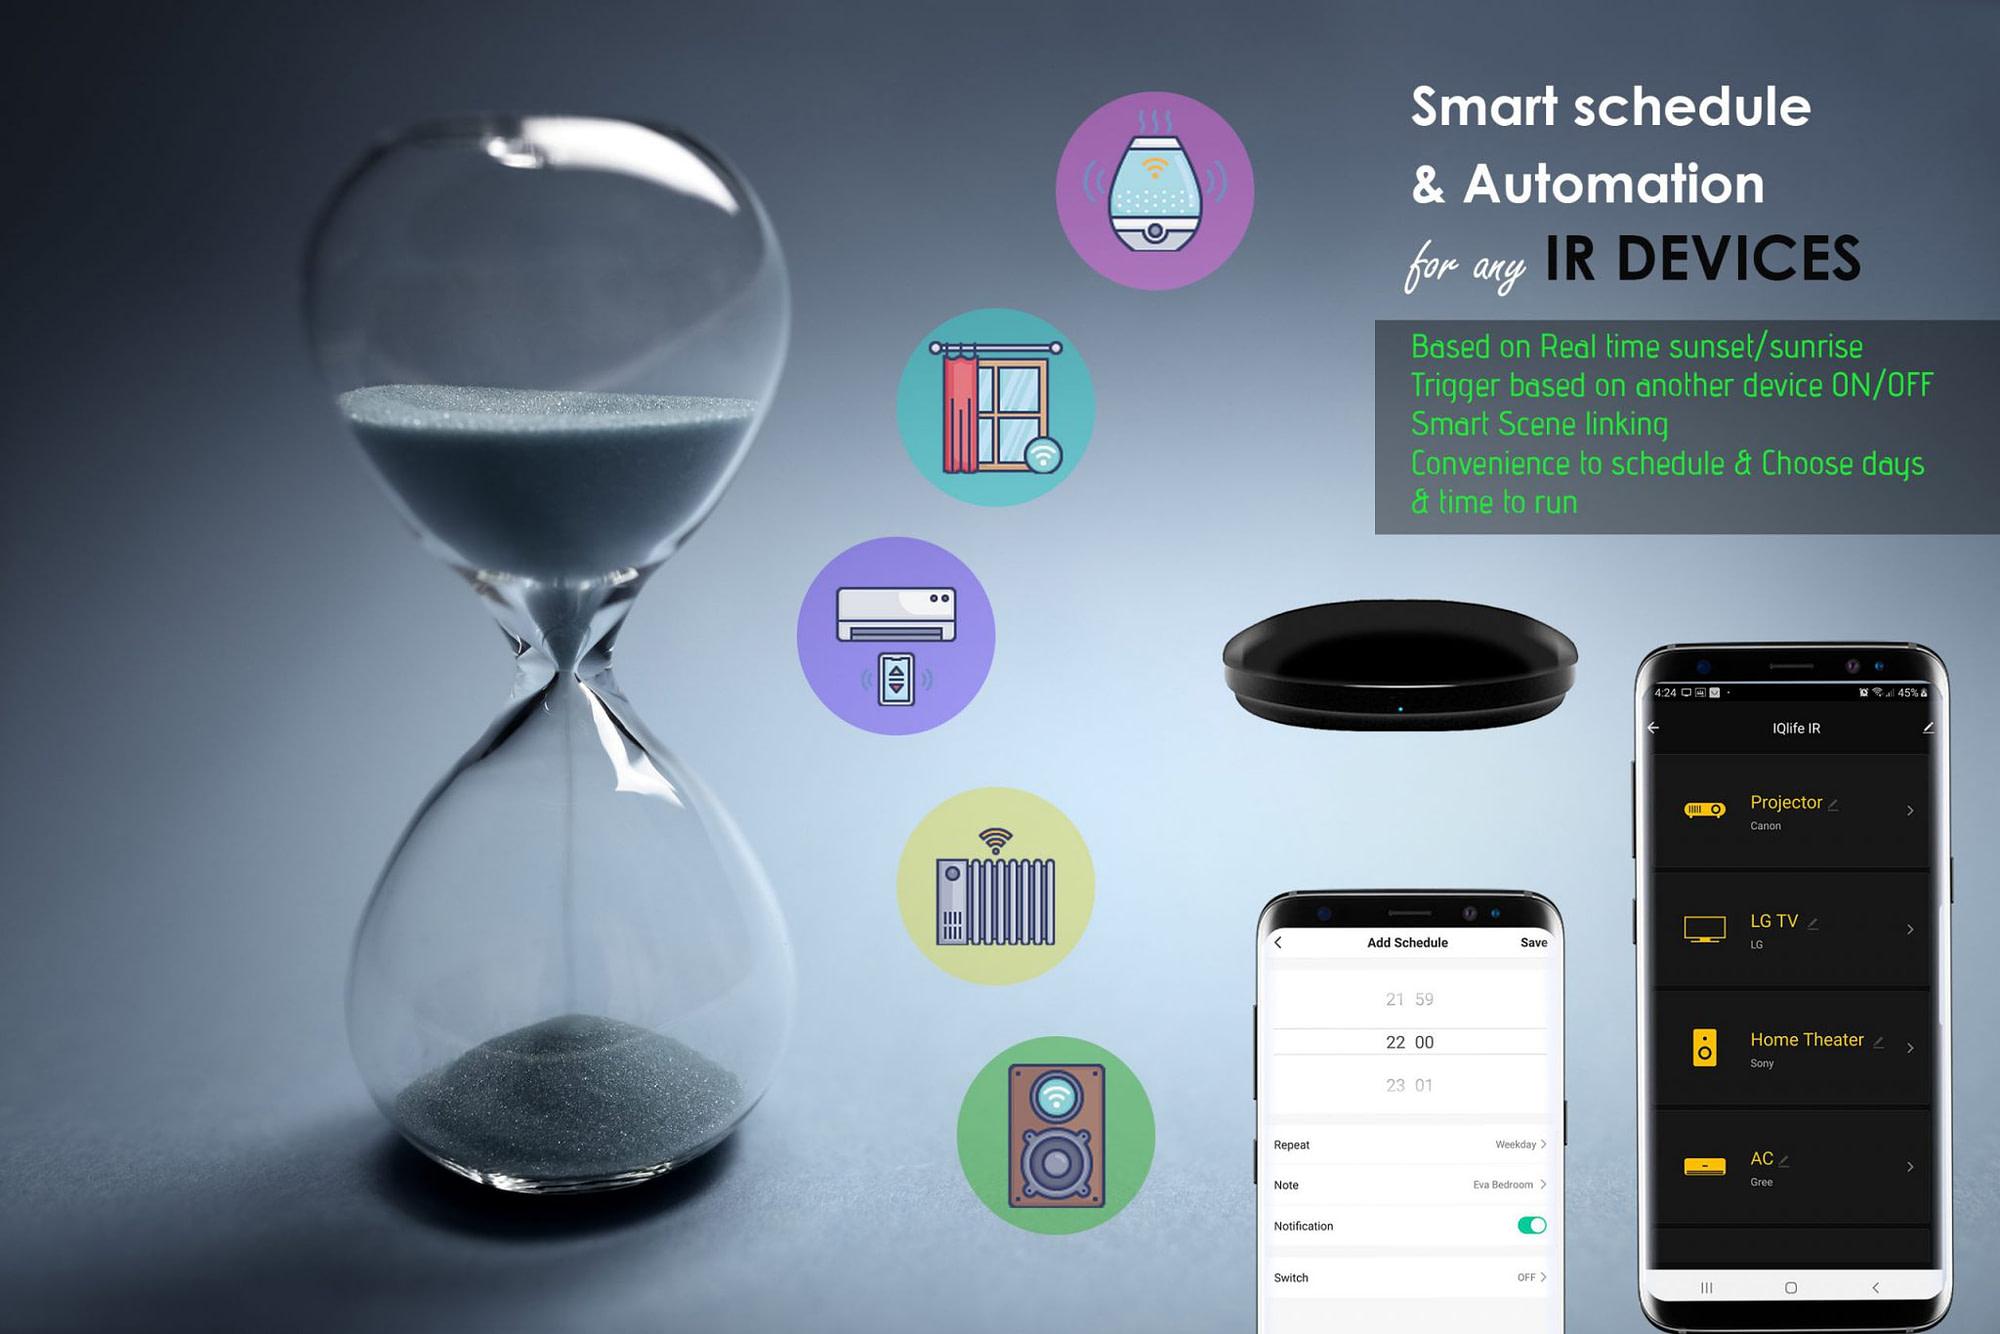 IQlife Smart Mobile Remote IR